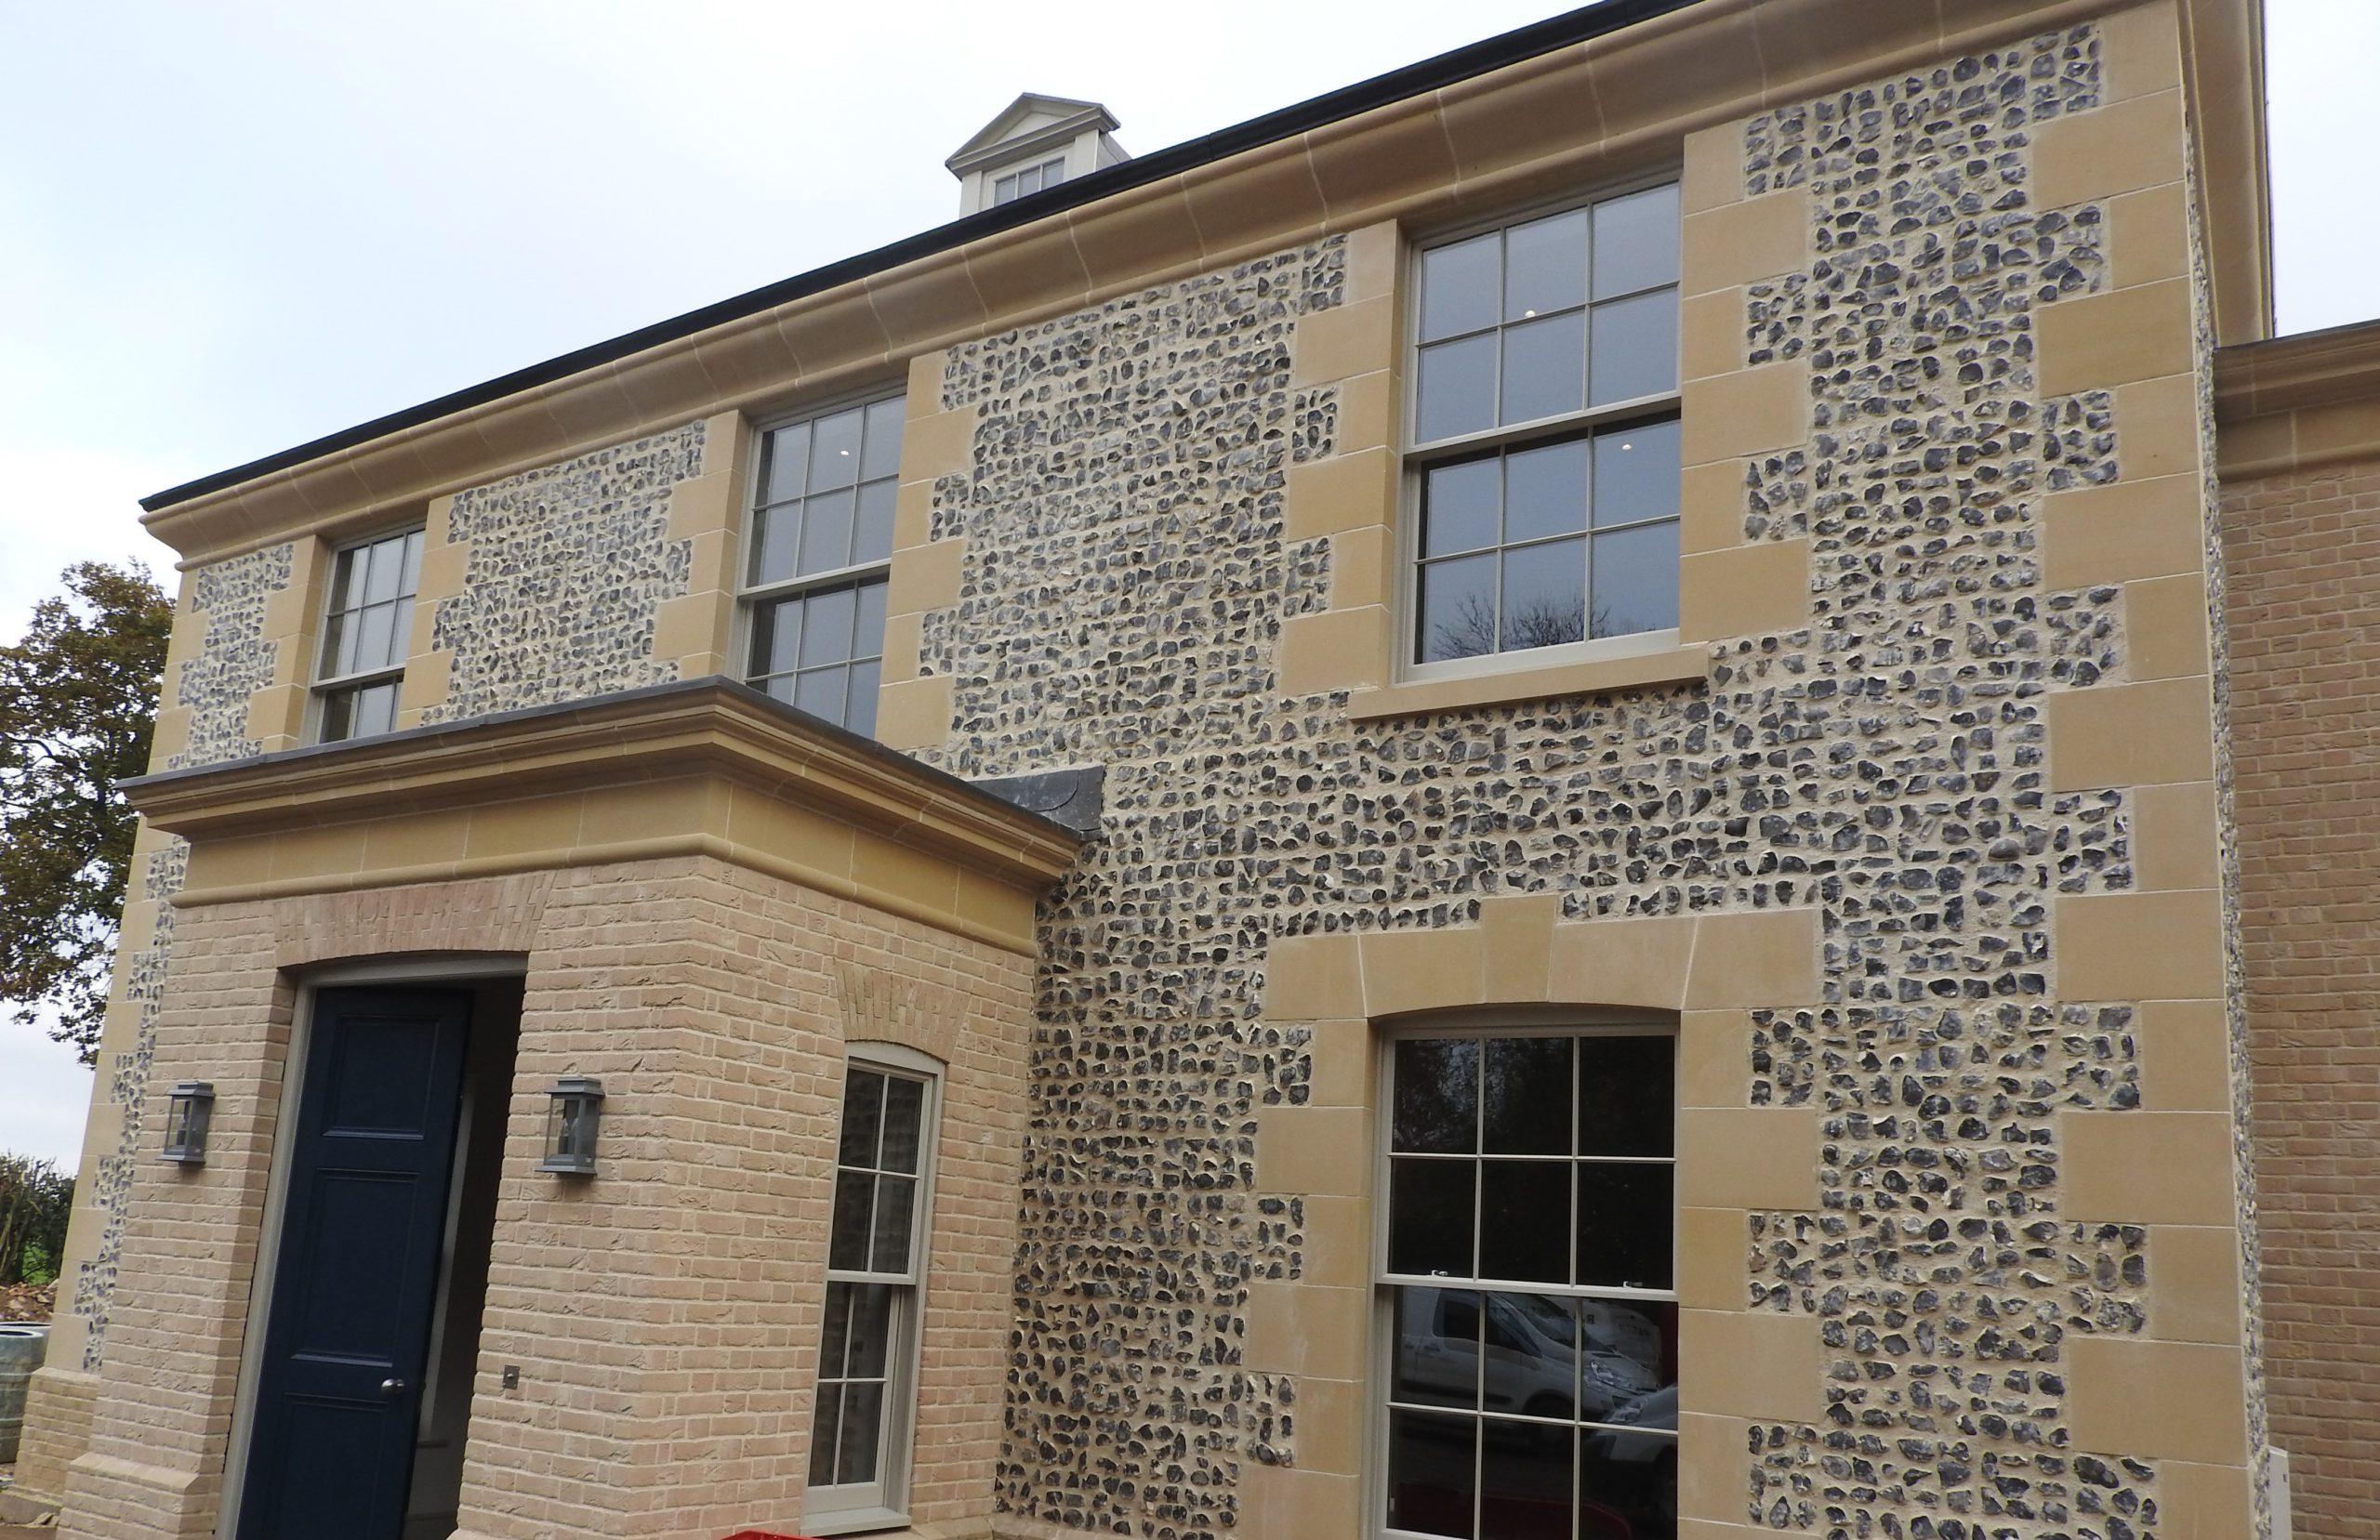 Flint block wall on house